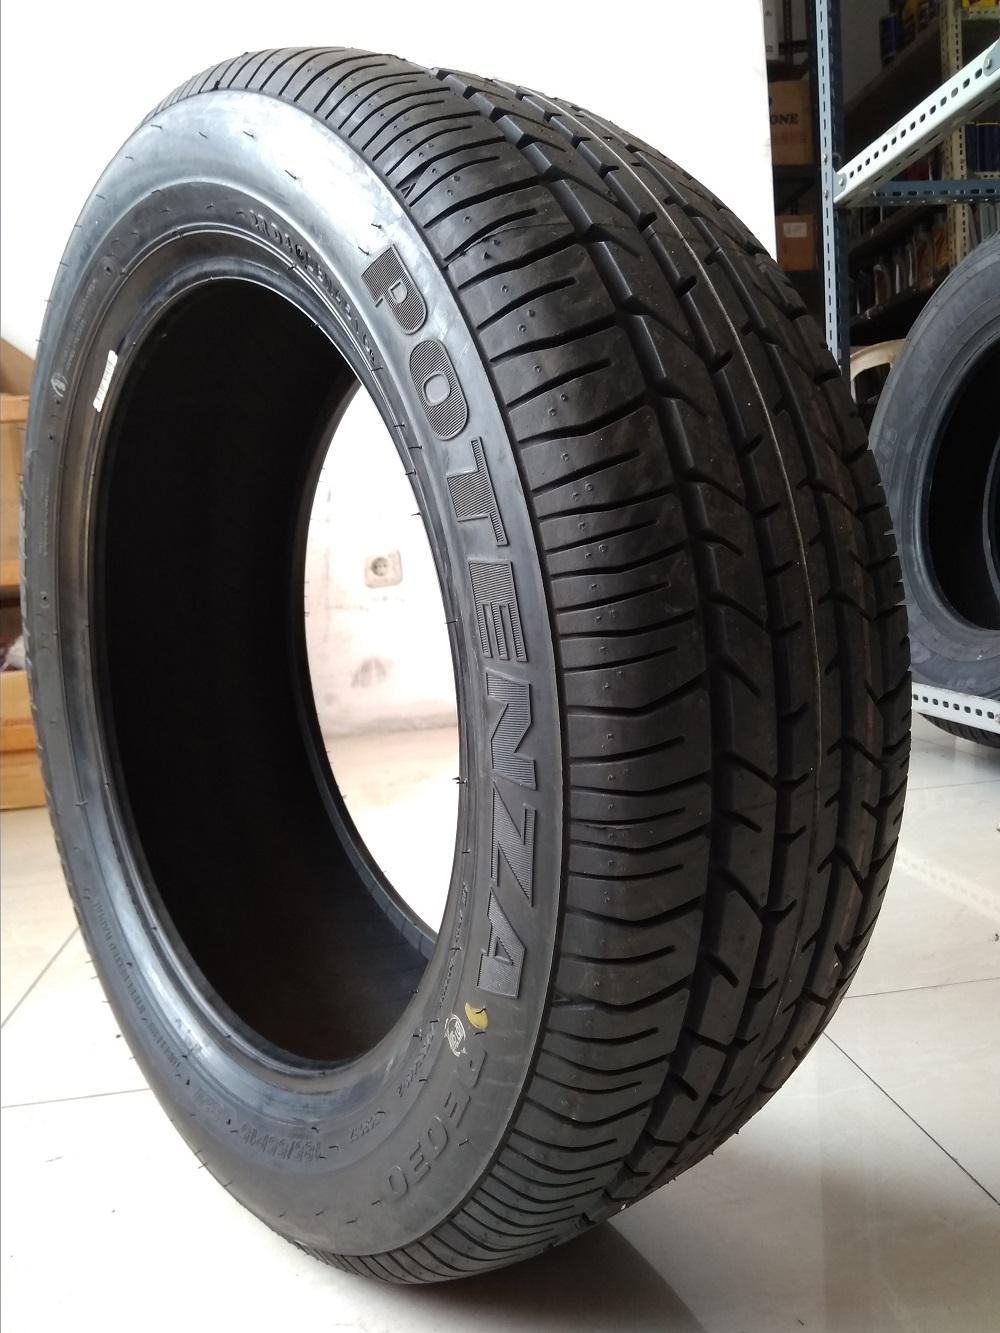 Bridgestone Ecopia Ep150 20565 R15 Ban Mobil Gratis Kirim Jawa Dunlop D80v4 205 65 Vocer Potenza Eo30 185 55 2